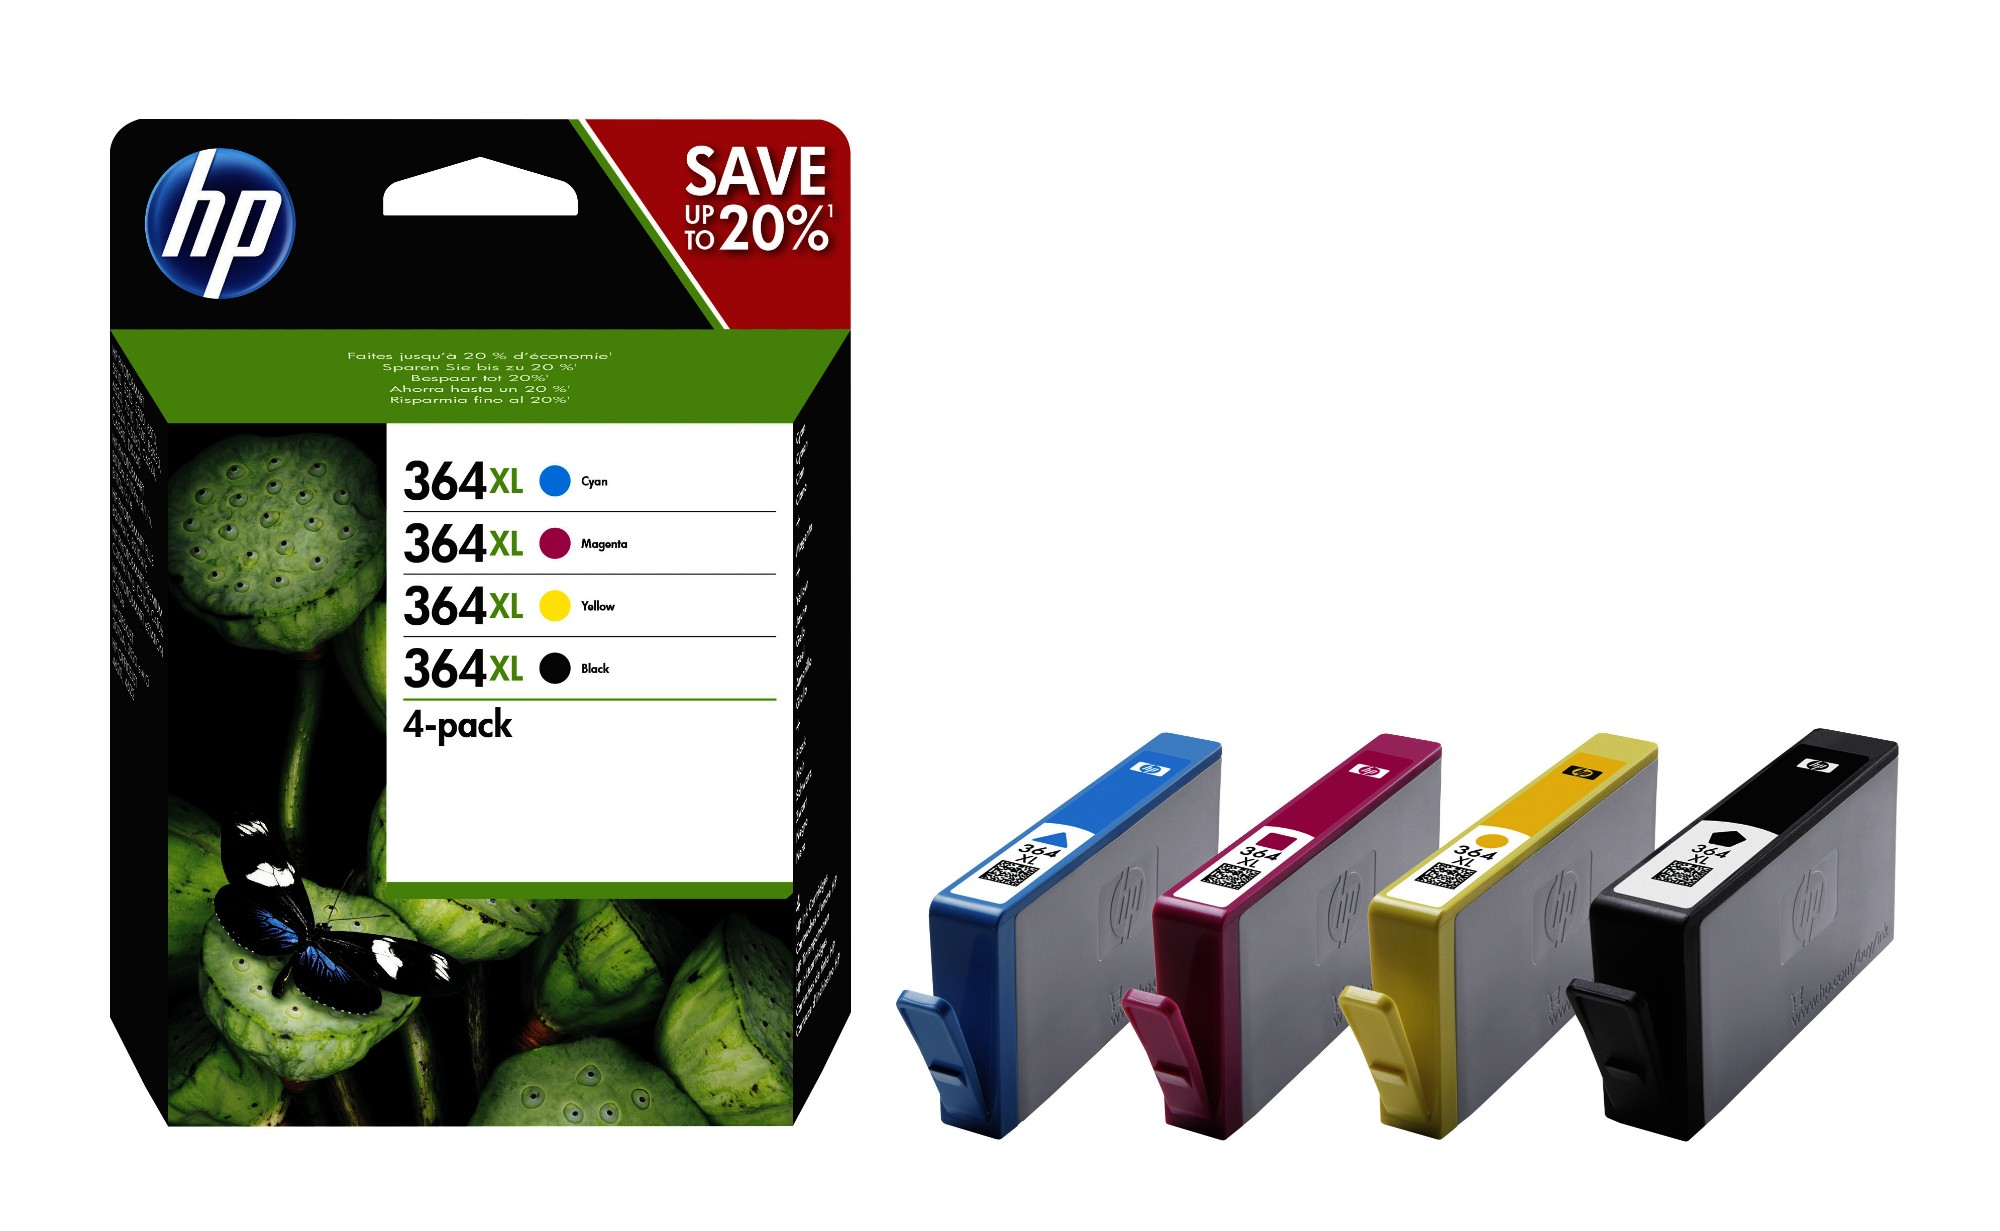 HP 364XL 4-pack High Yield Black/Cyan/Magenta/Yellow Original Ink Cartridges Negro, Cian, Magenta, Amarillo